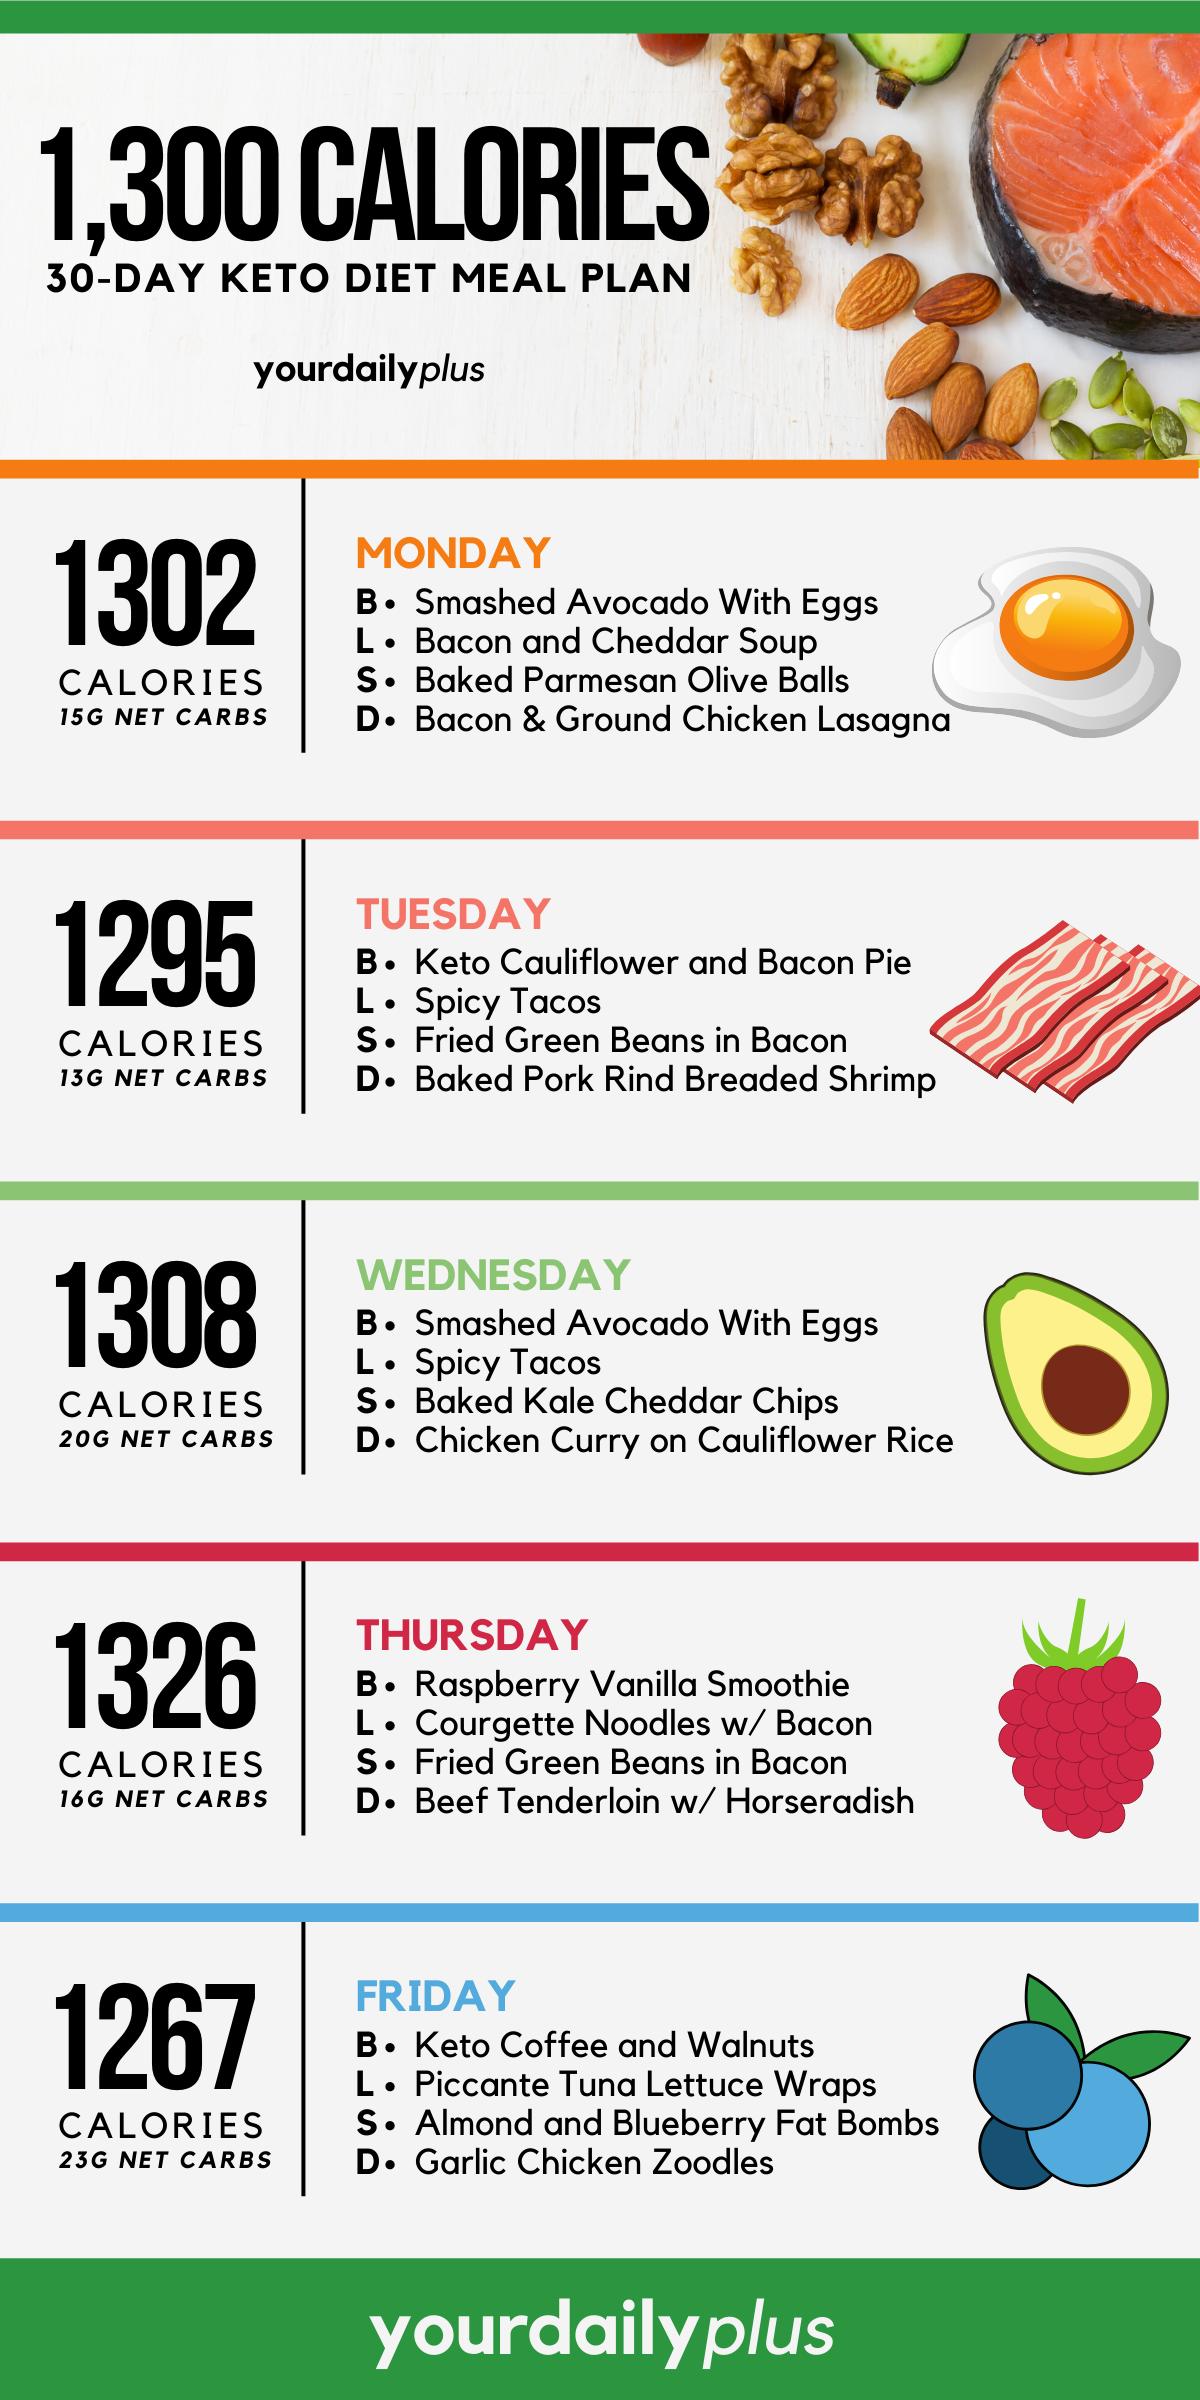 Lowcarbbreakfastrecipes Ketogenic Diet Meal Plan Keto Diet Meal Plan Keto Meal Plan